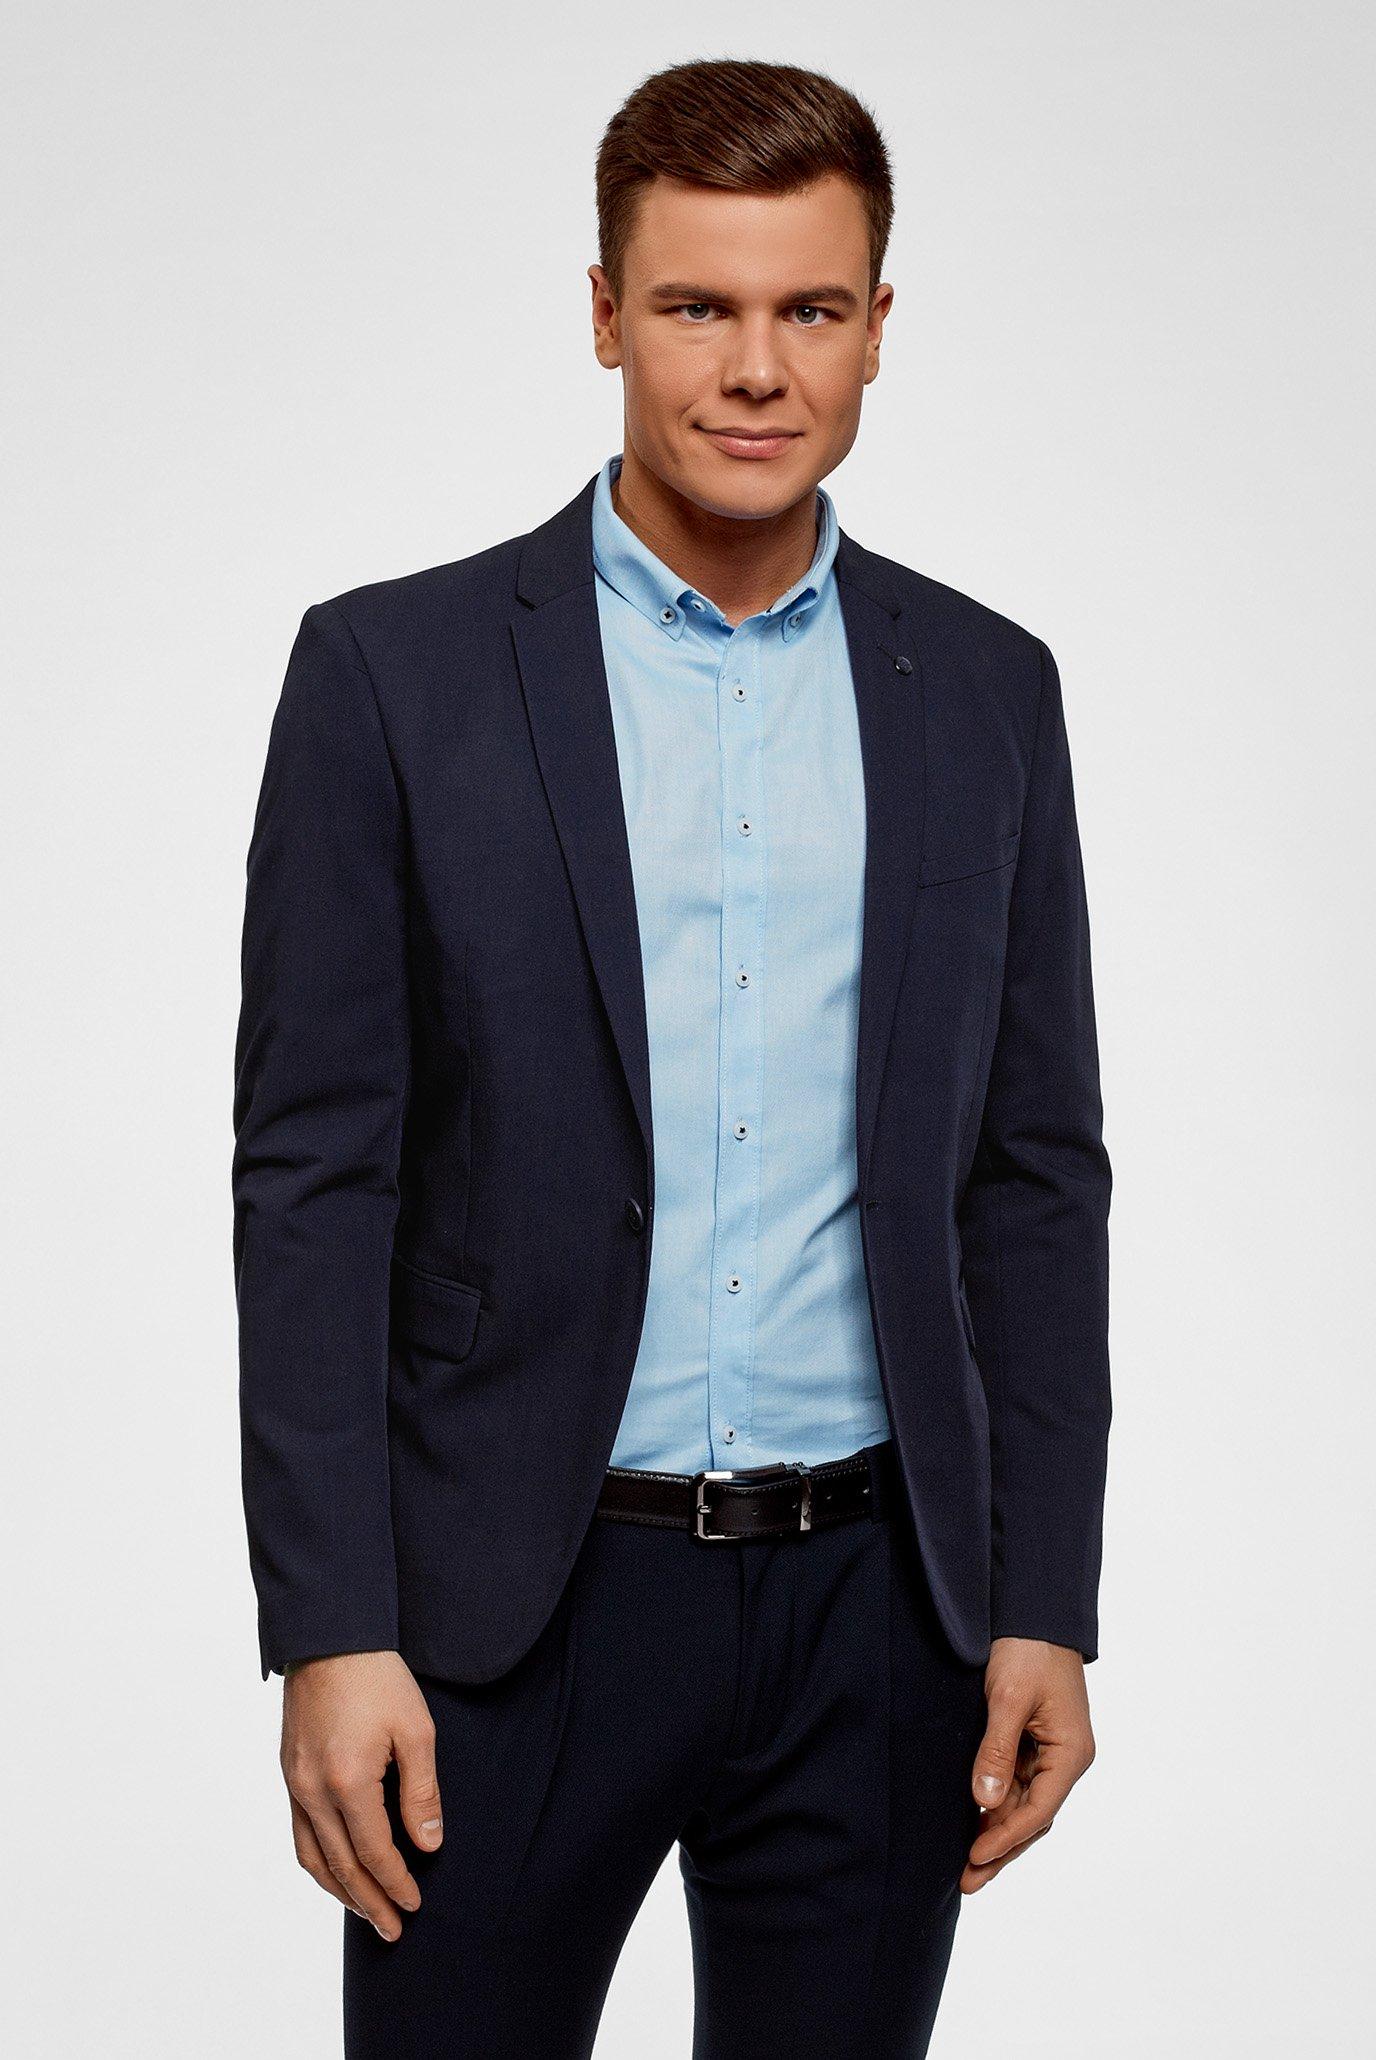 Купить Мужской темно-синий пиджак Oodji Oodji 2B410021M/47747N/7901N – Киев, Украина. Цены в интернет магазине MD Fashion